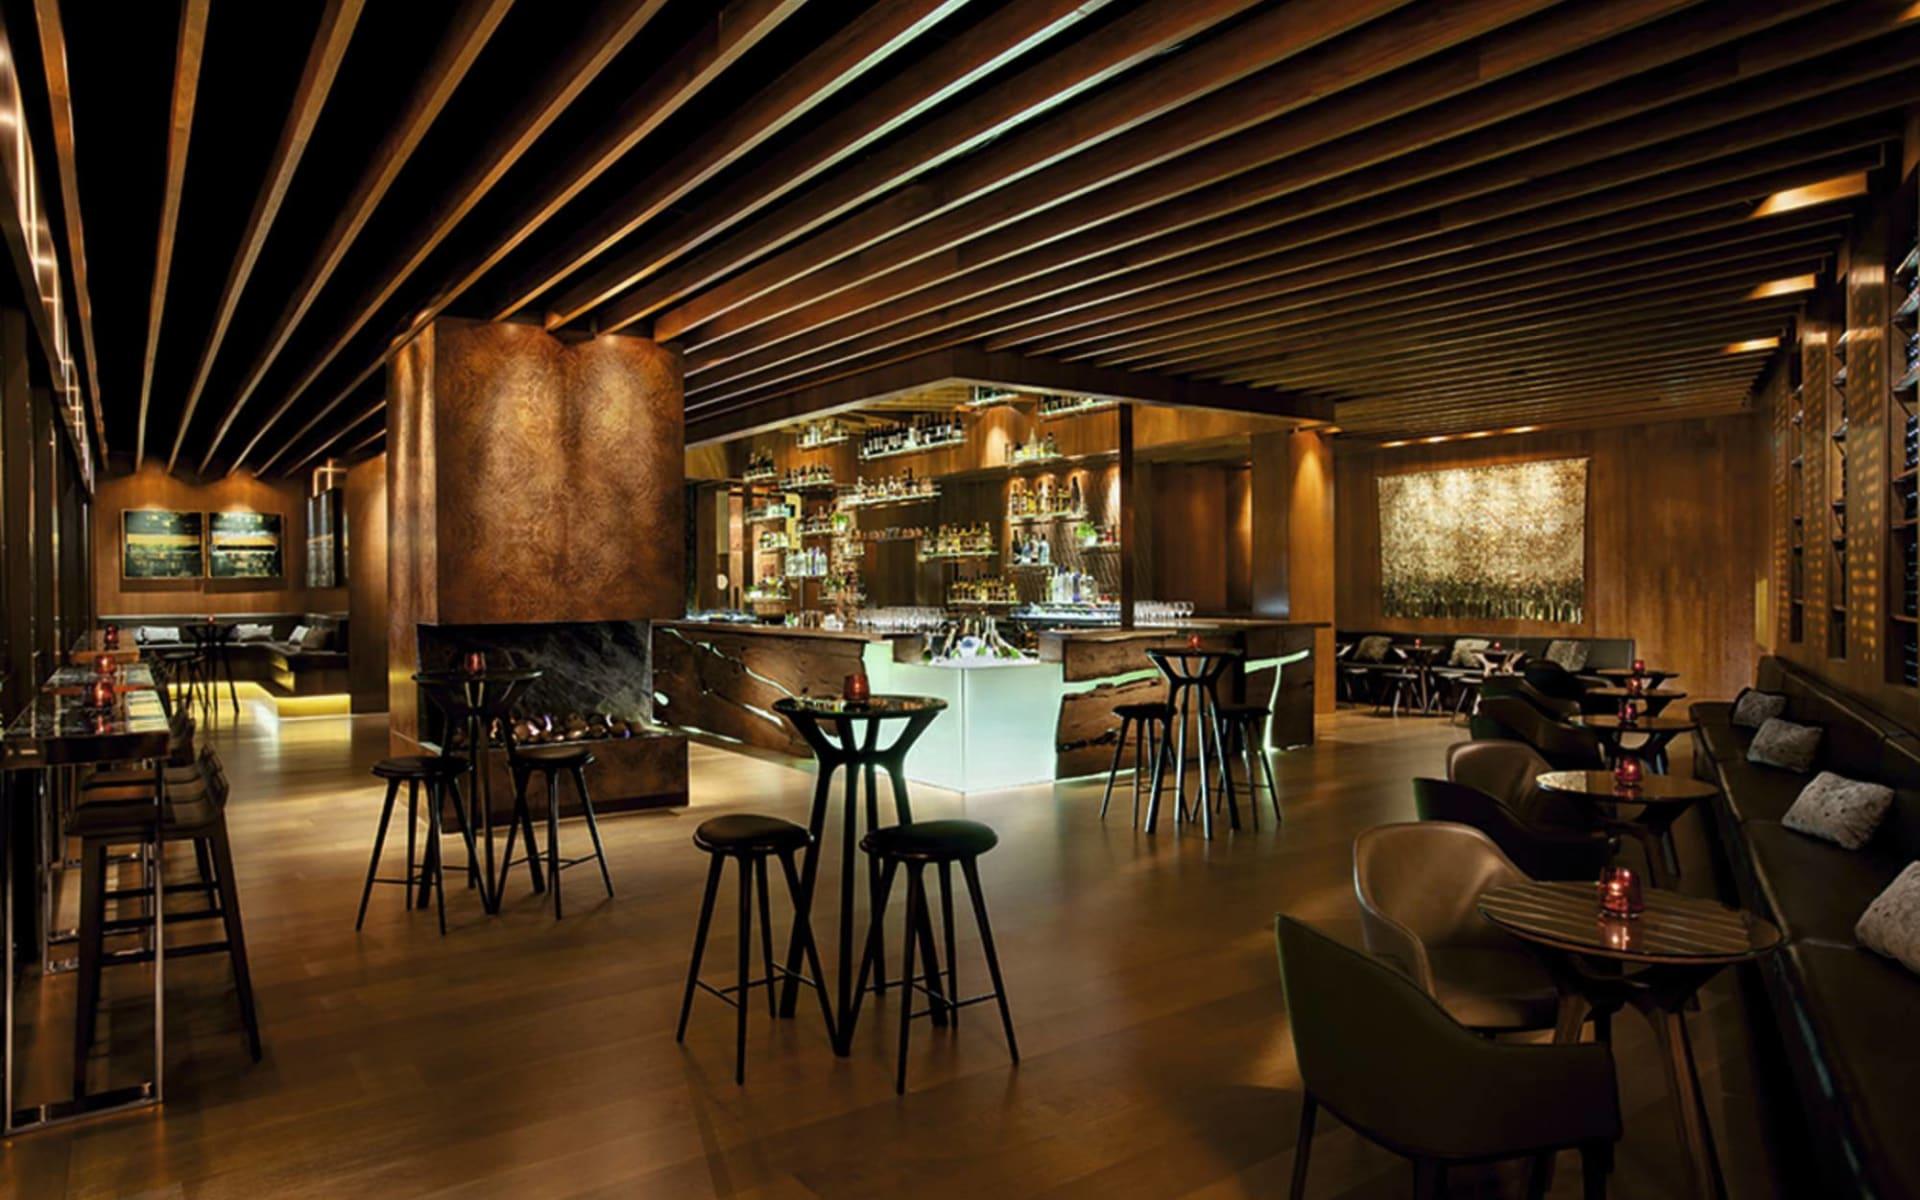 Four Seasons Hotel Sydney:  Four Seasons Hotel Sydney - Bar/ Restaurant